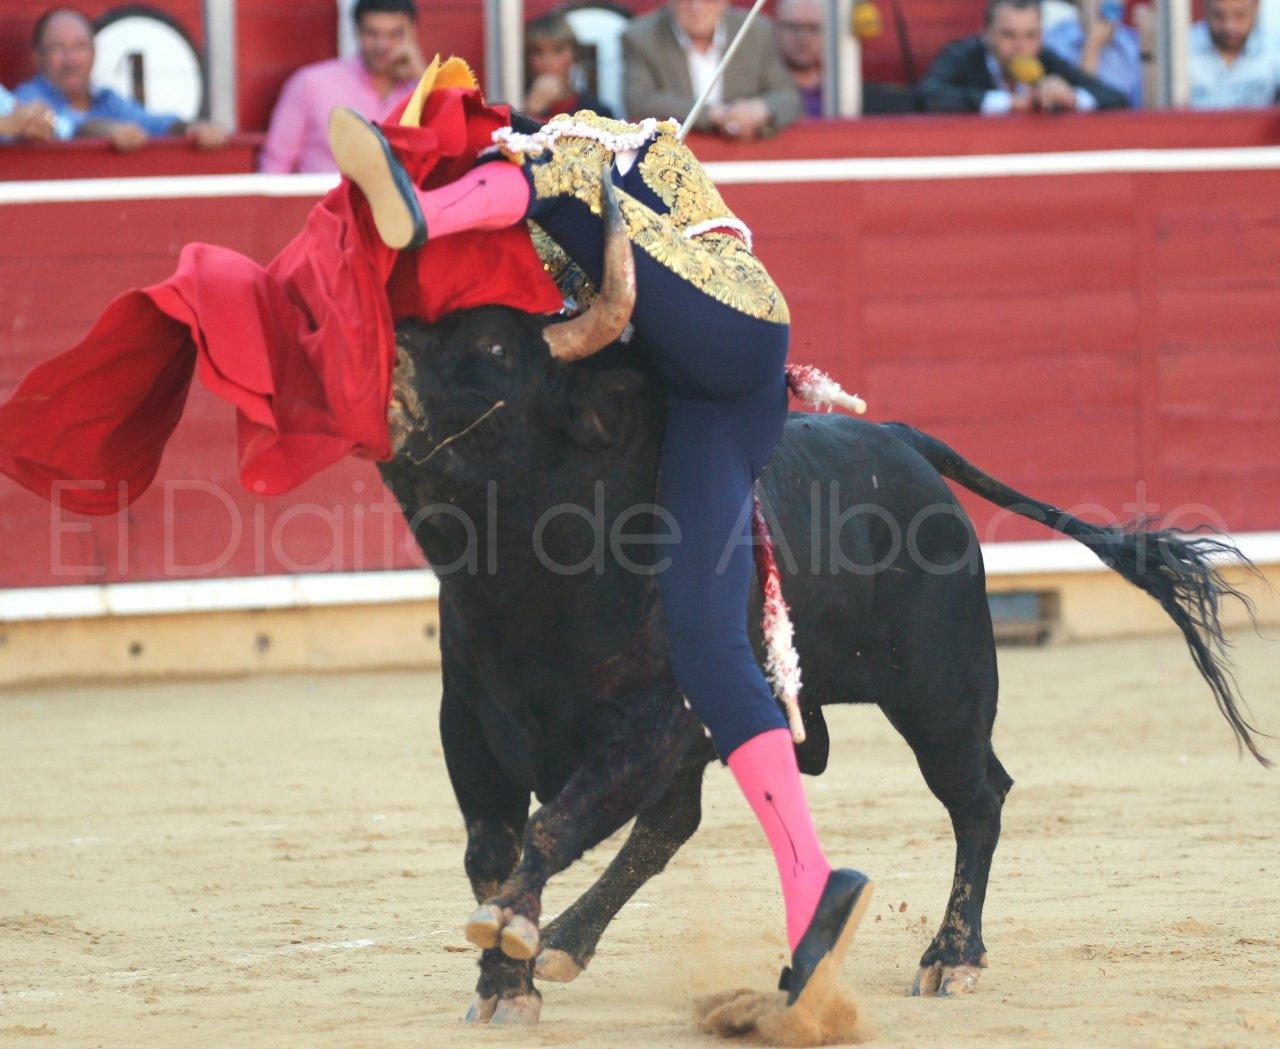 El Juli Lopez Simon y Garrido Feria Albacete 2015 toros  40